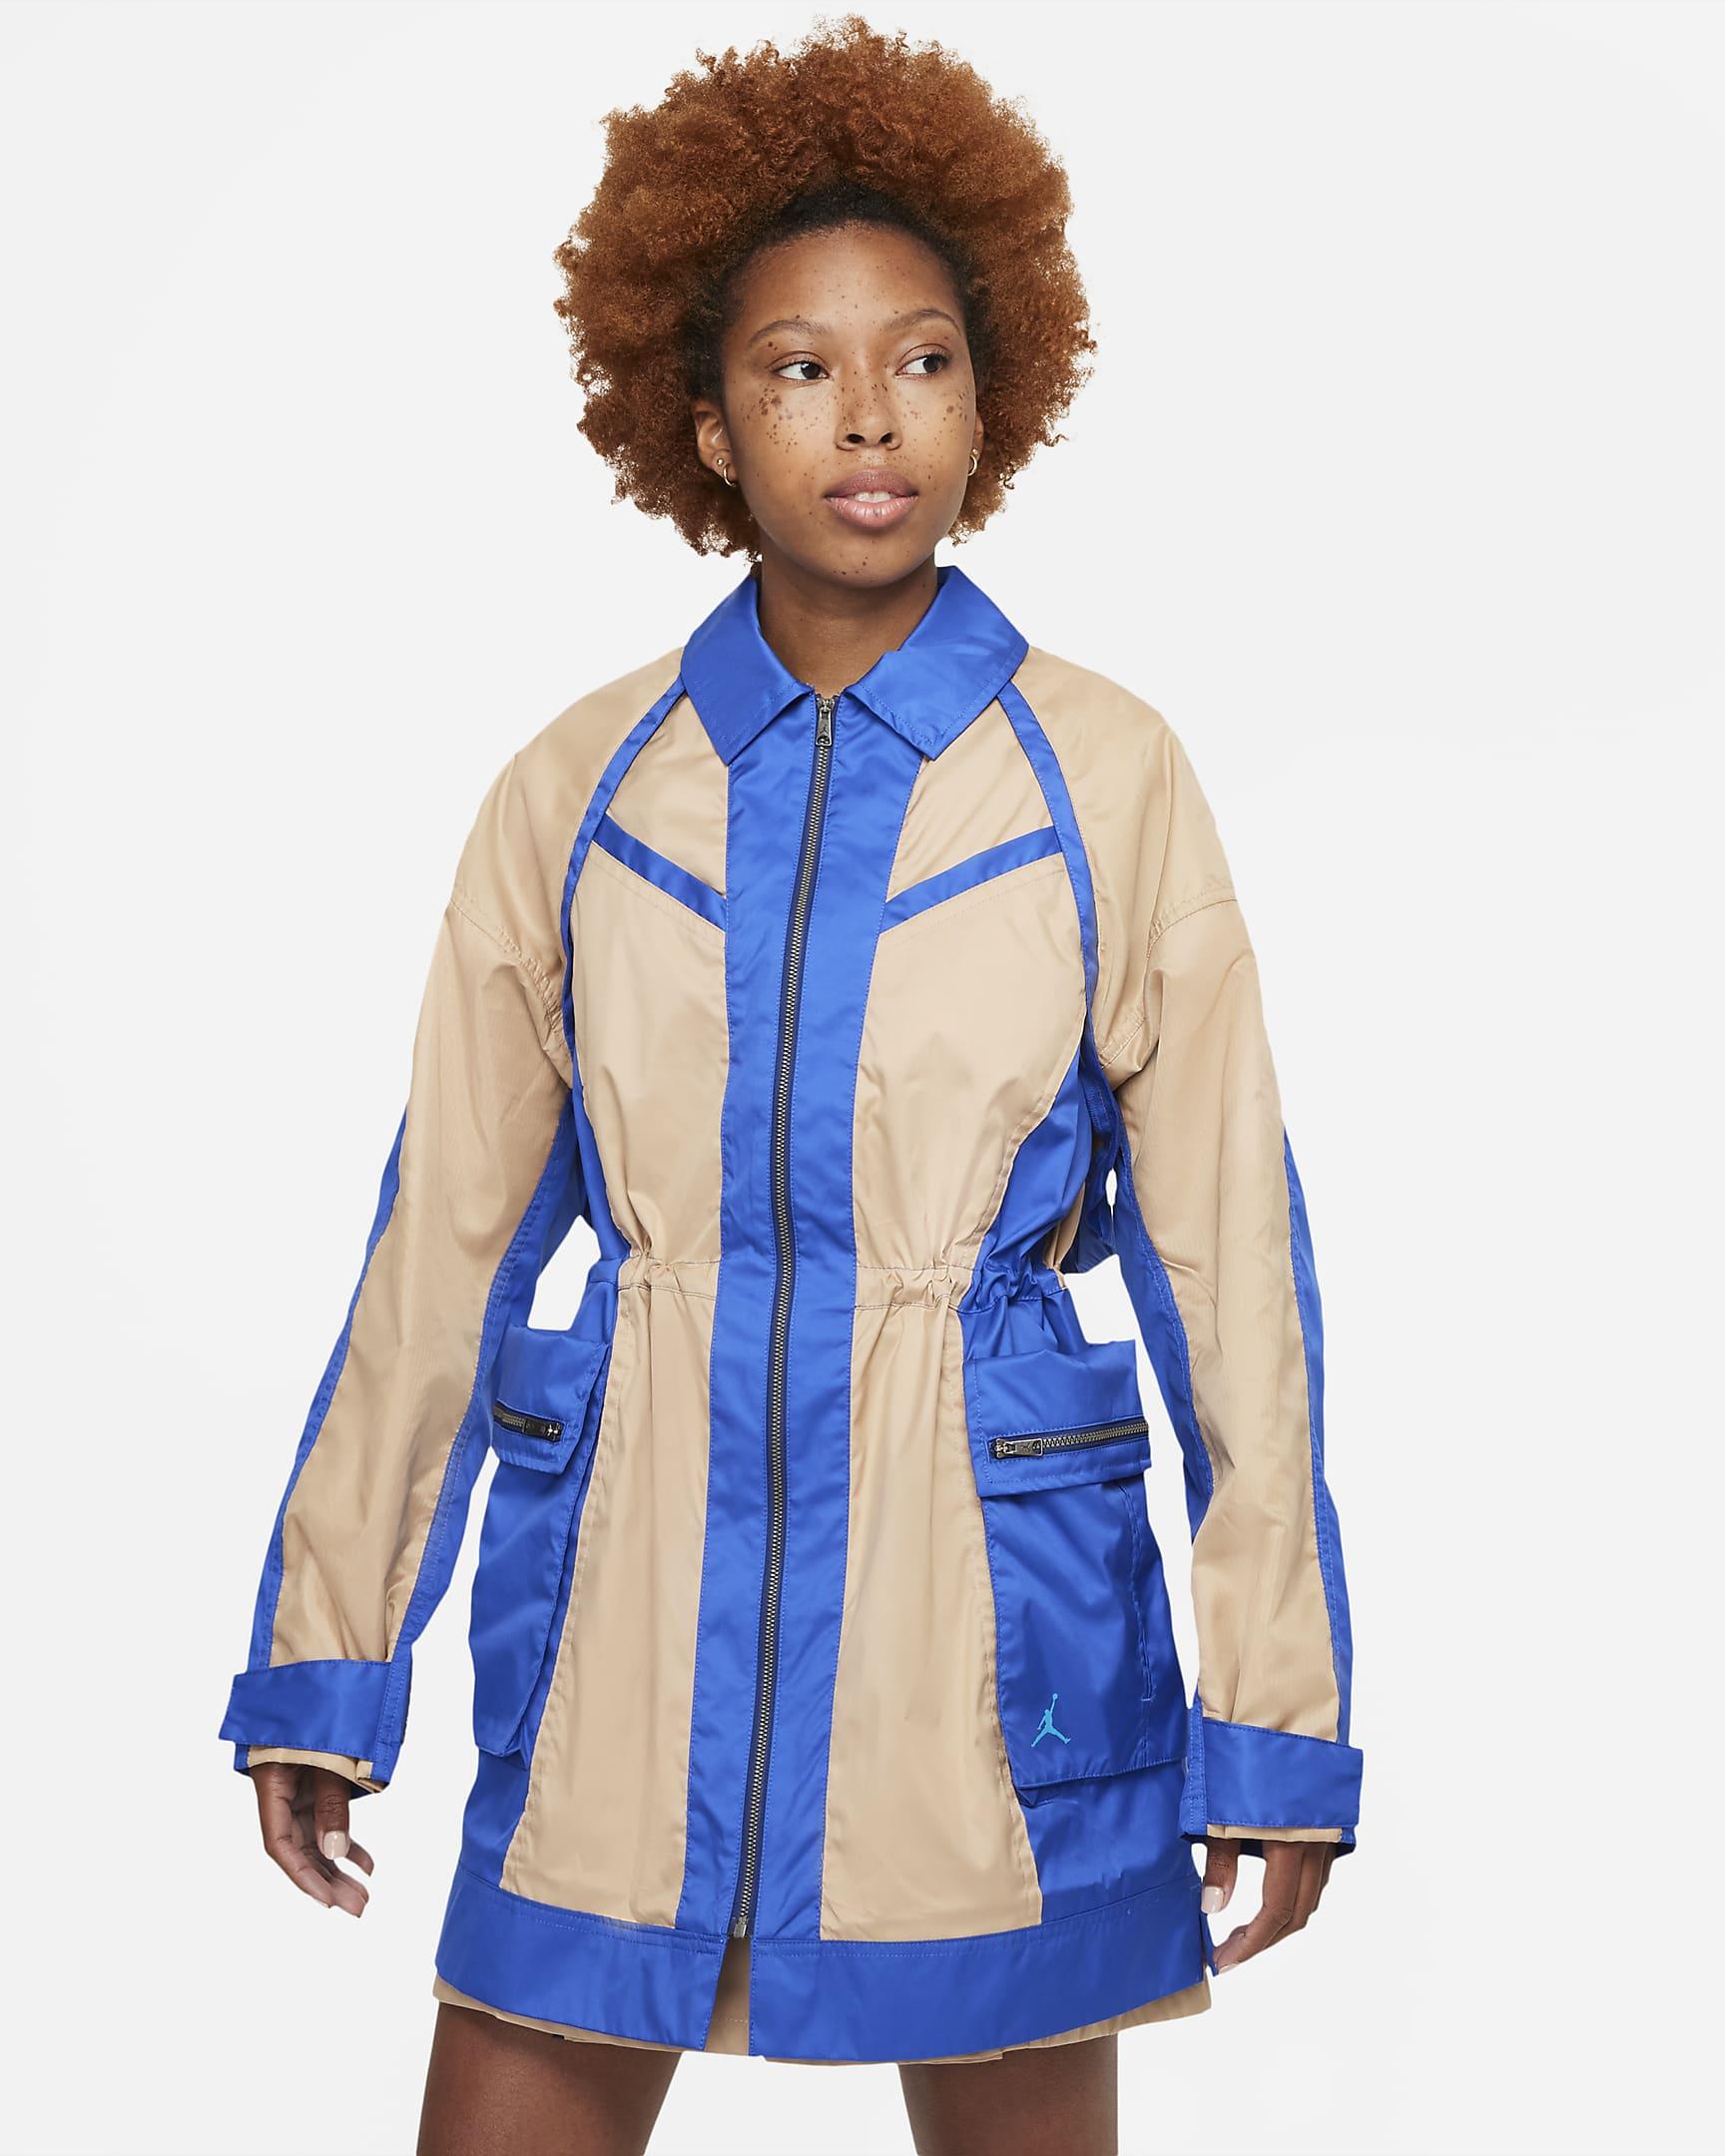 jordan-next-utility-capsule-womens-jacket-rhM8Kn.png